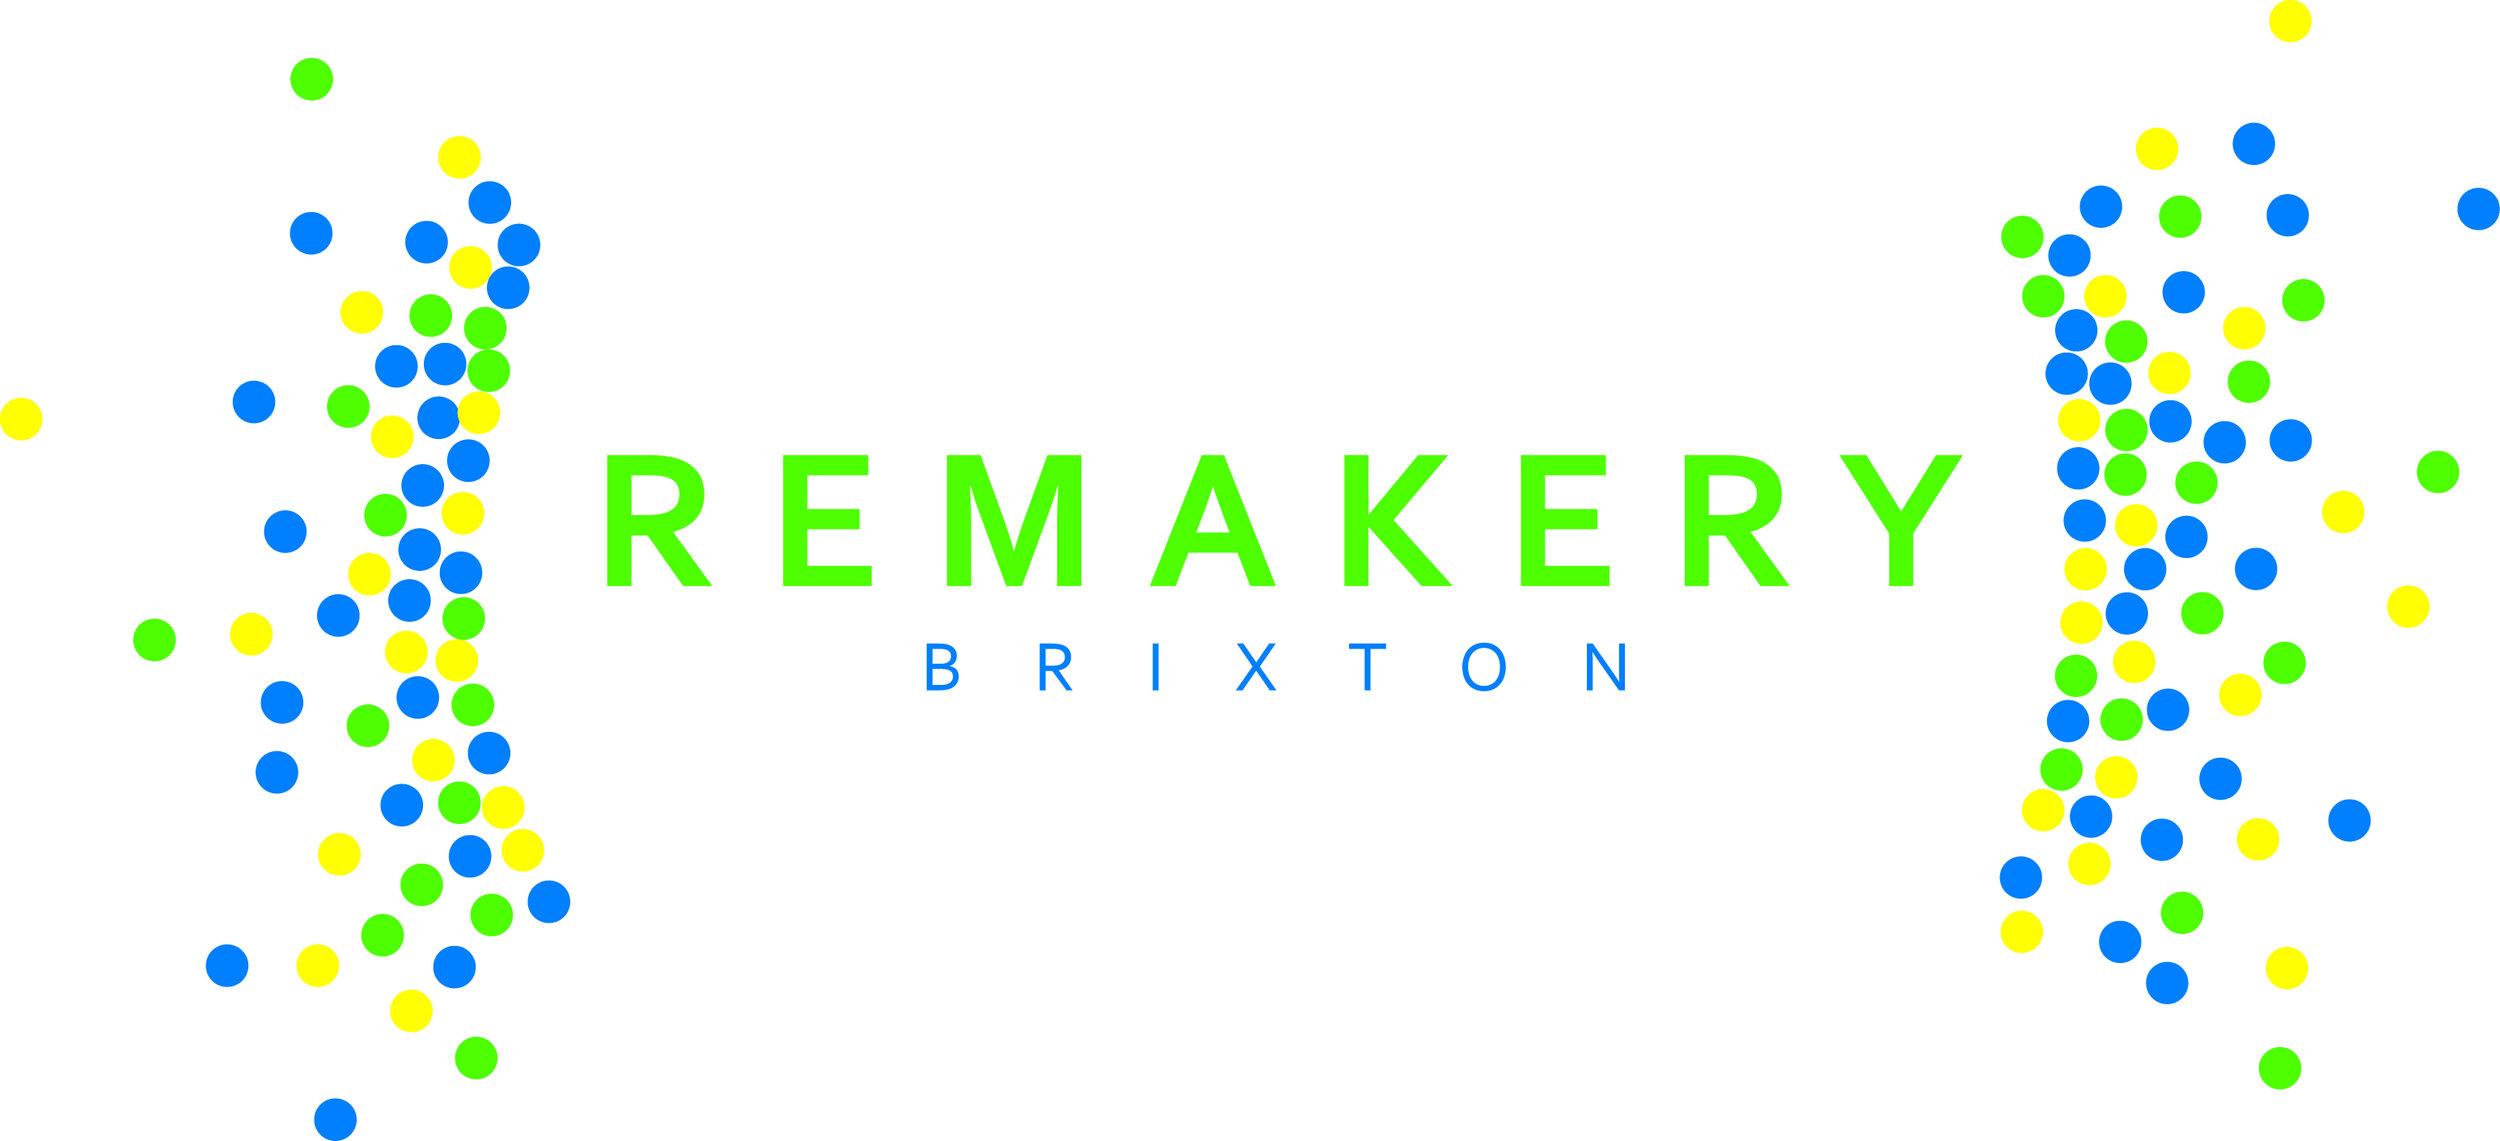 Copy of Brixton Remakery